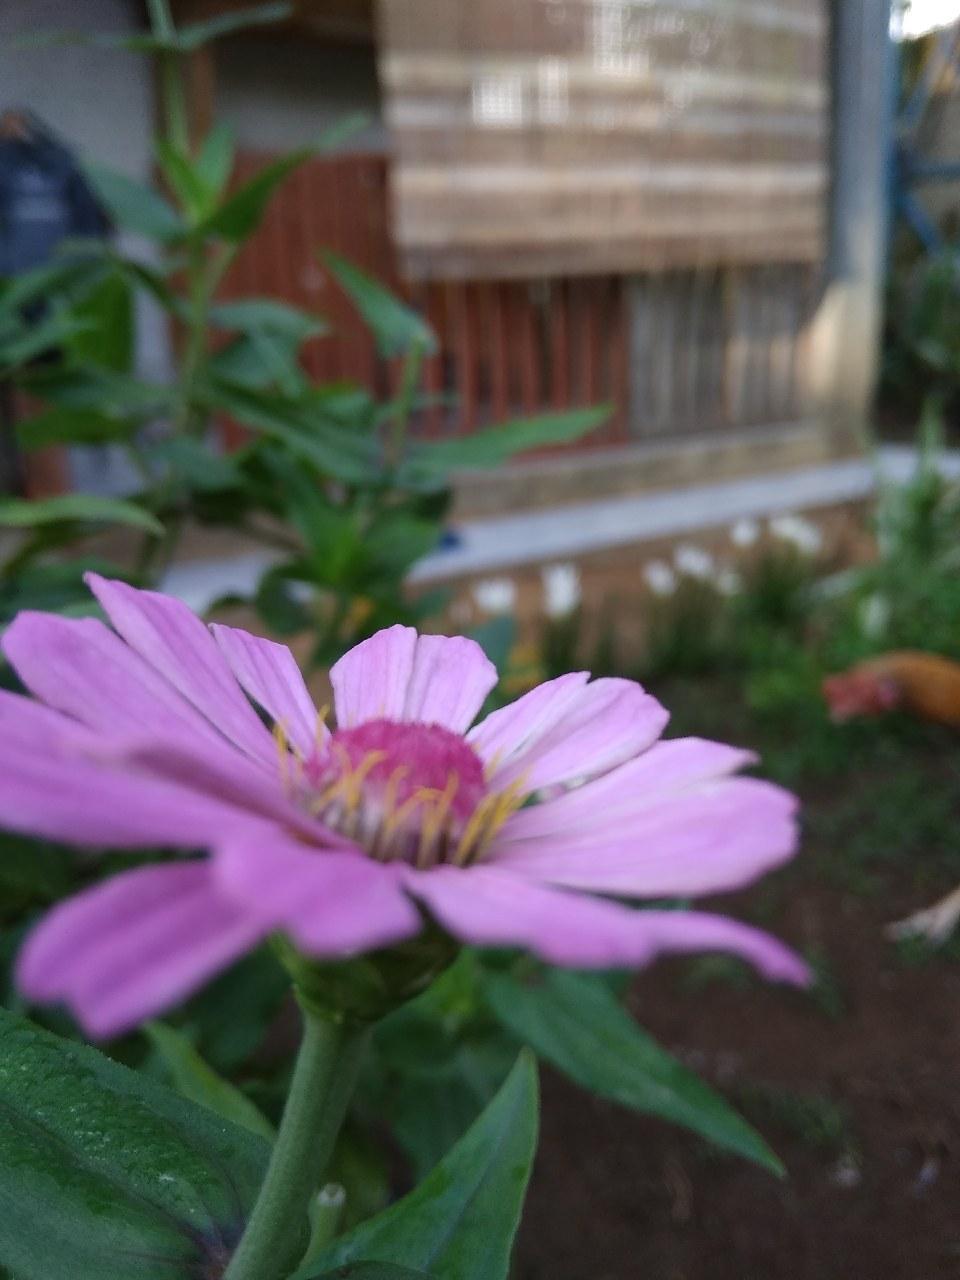 Indah Nya Bunga Ini Mekar Di Pagi Hari Fotografi Mi Community